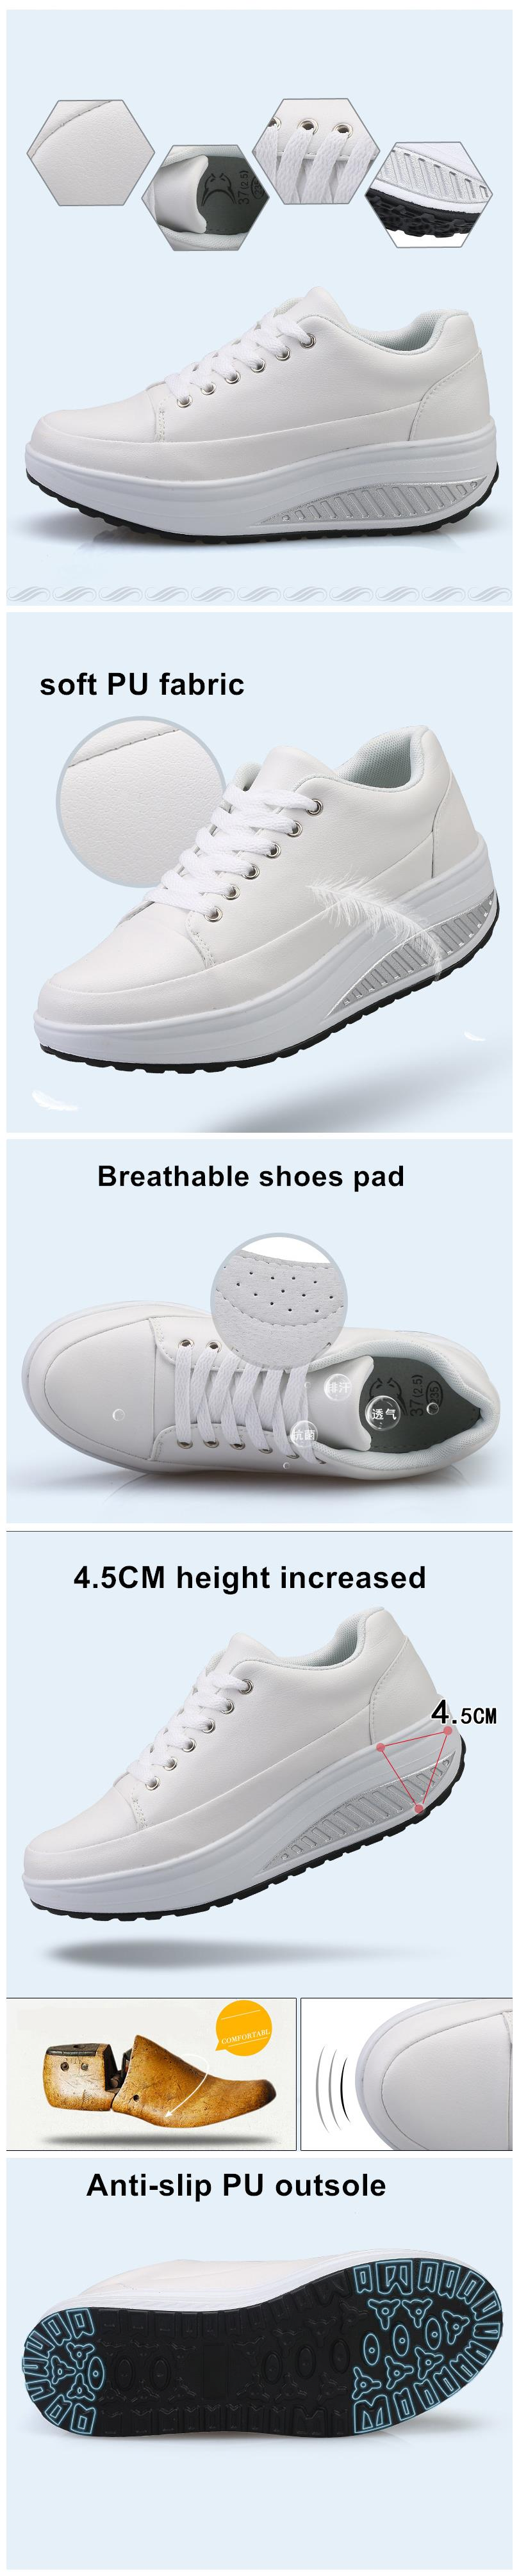 Cheap toning shoes